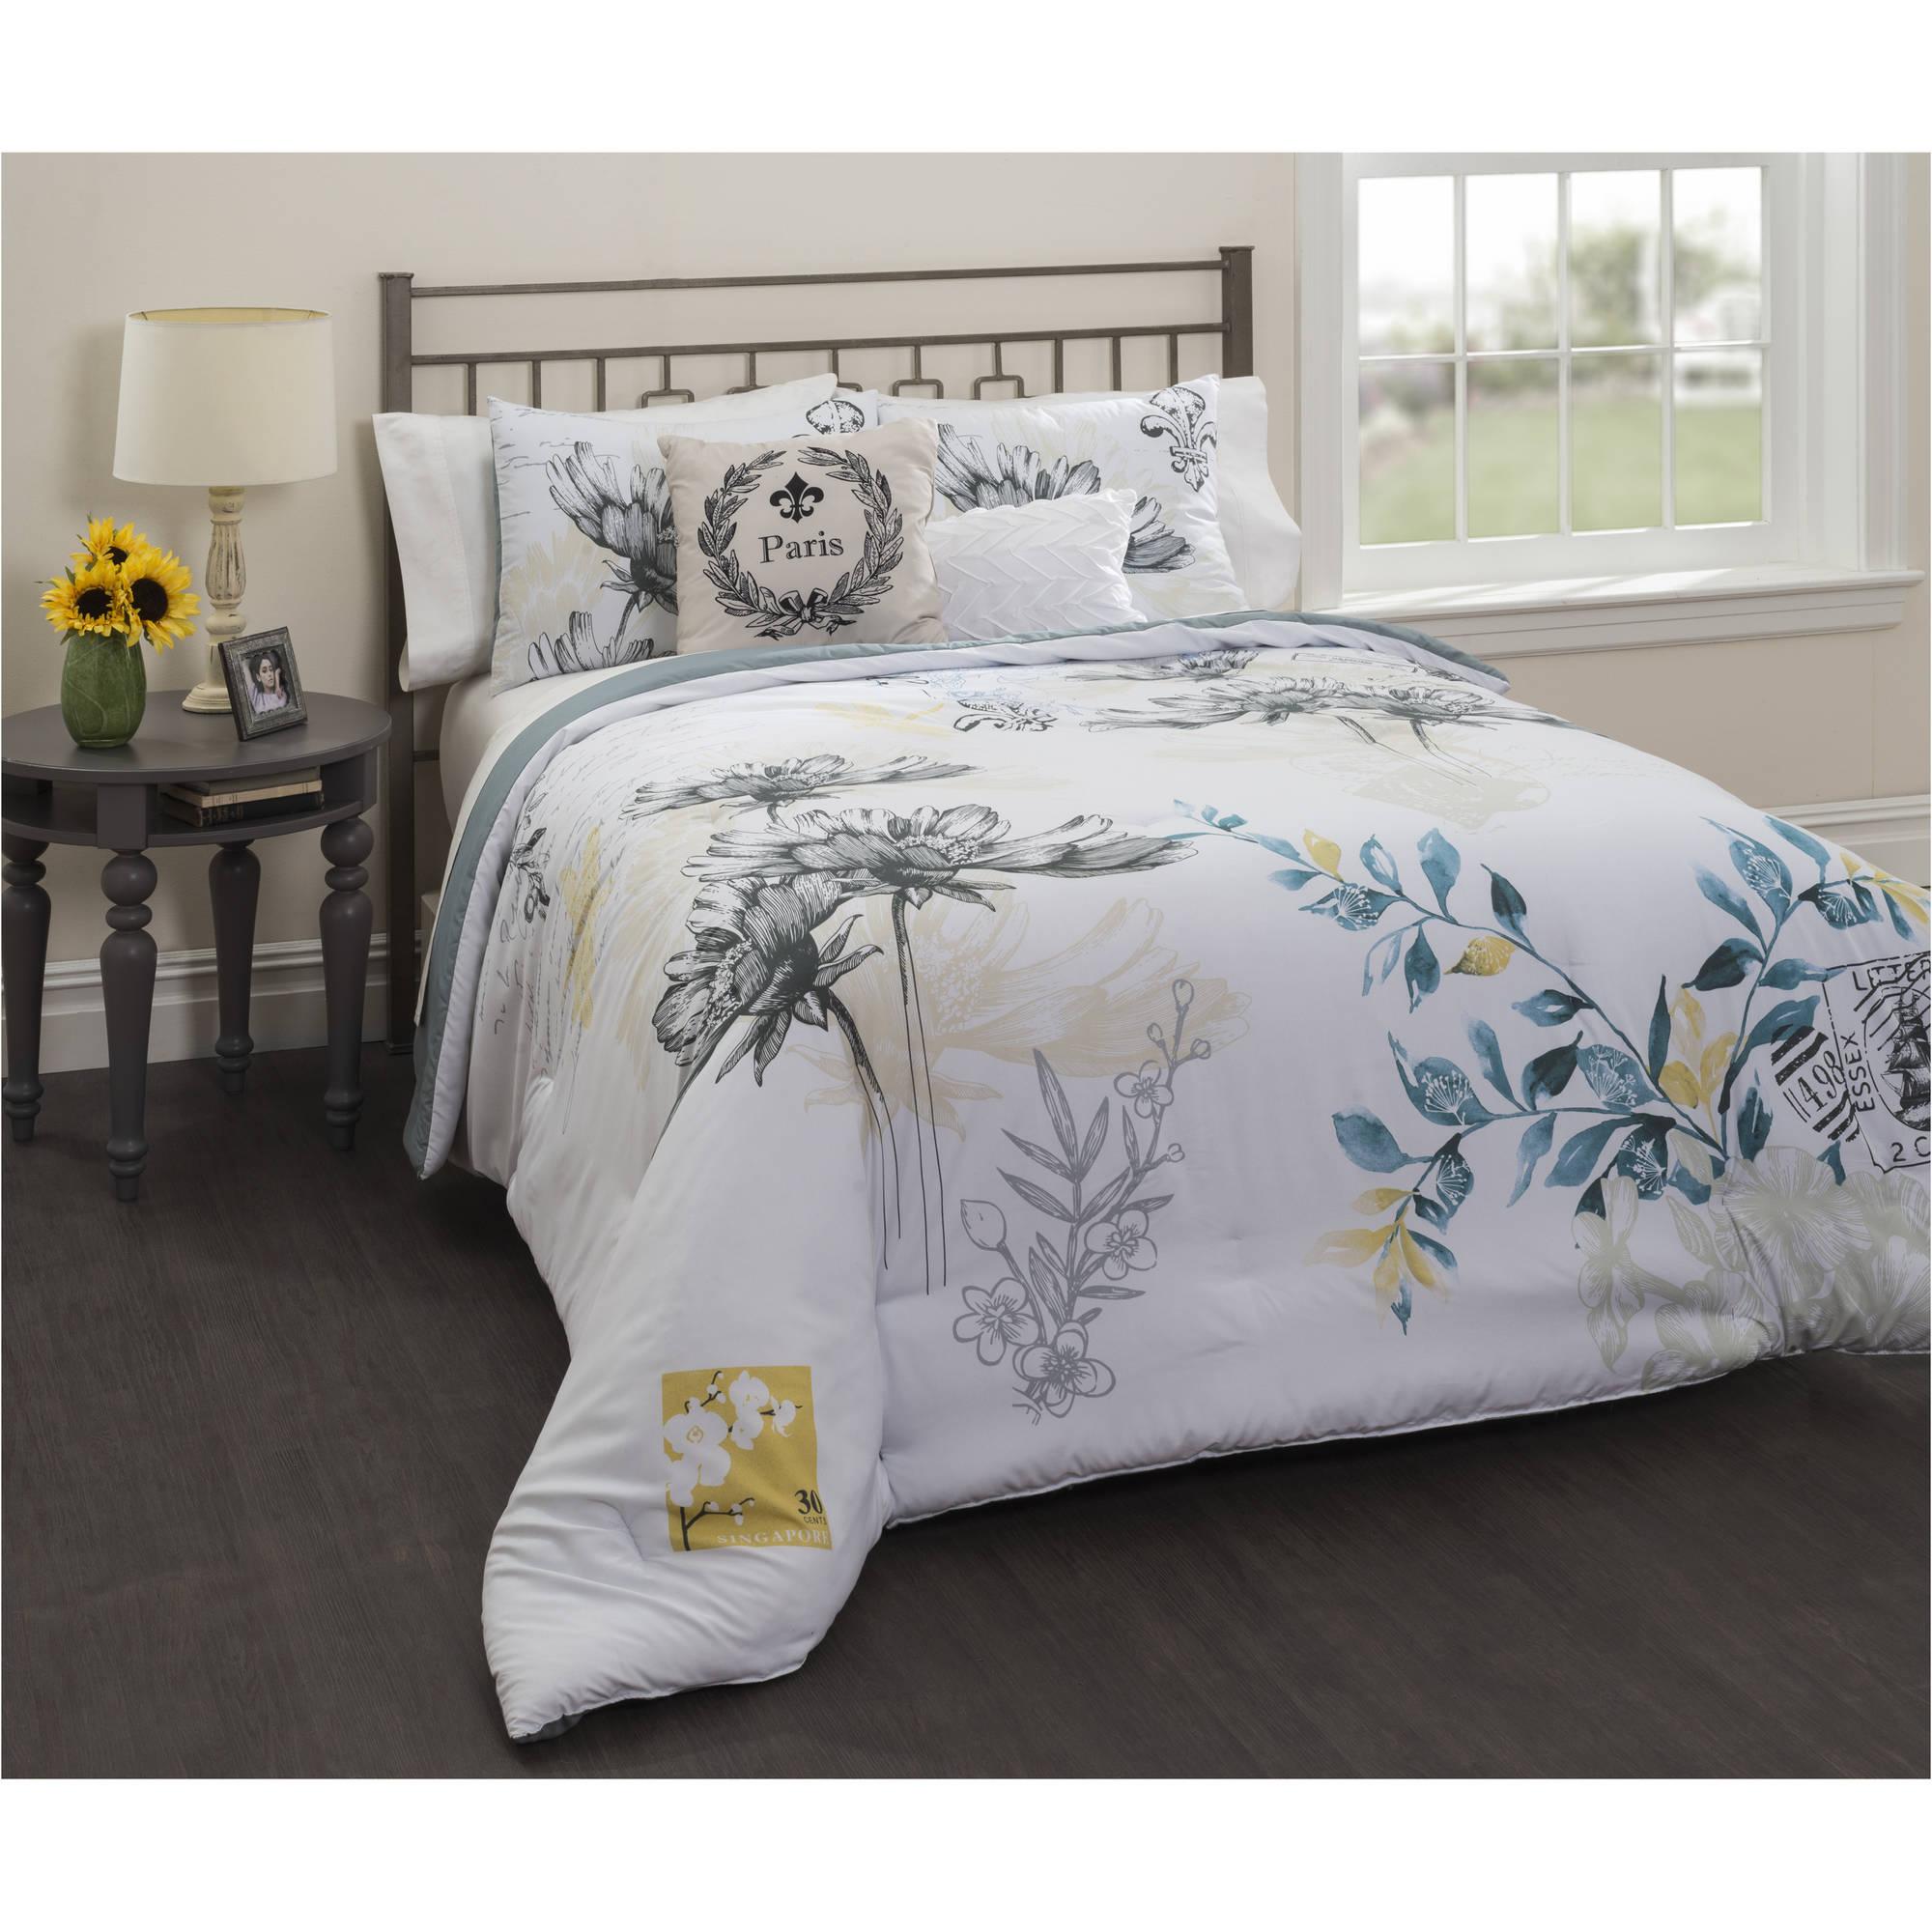 Casa Lyon 5-Piece Comforter Bedding Set